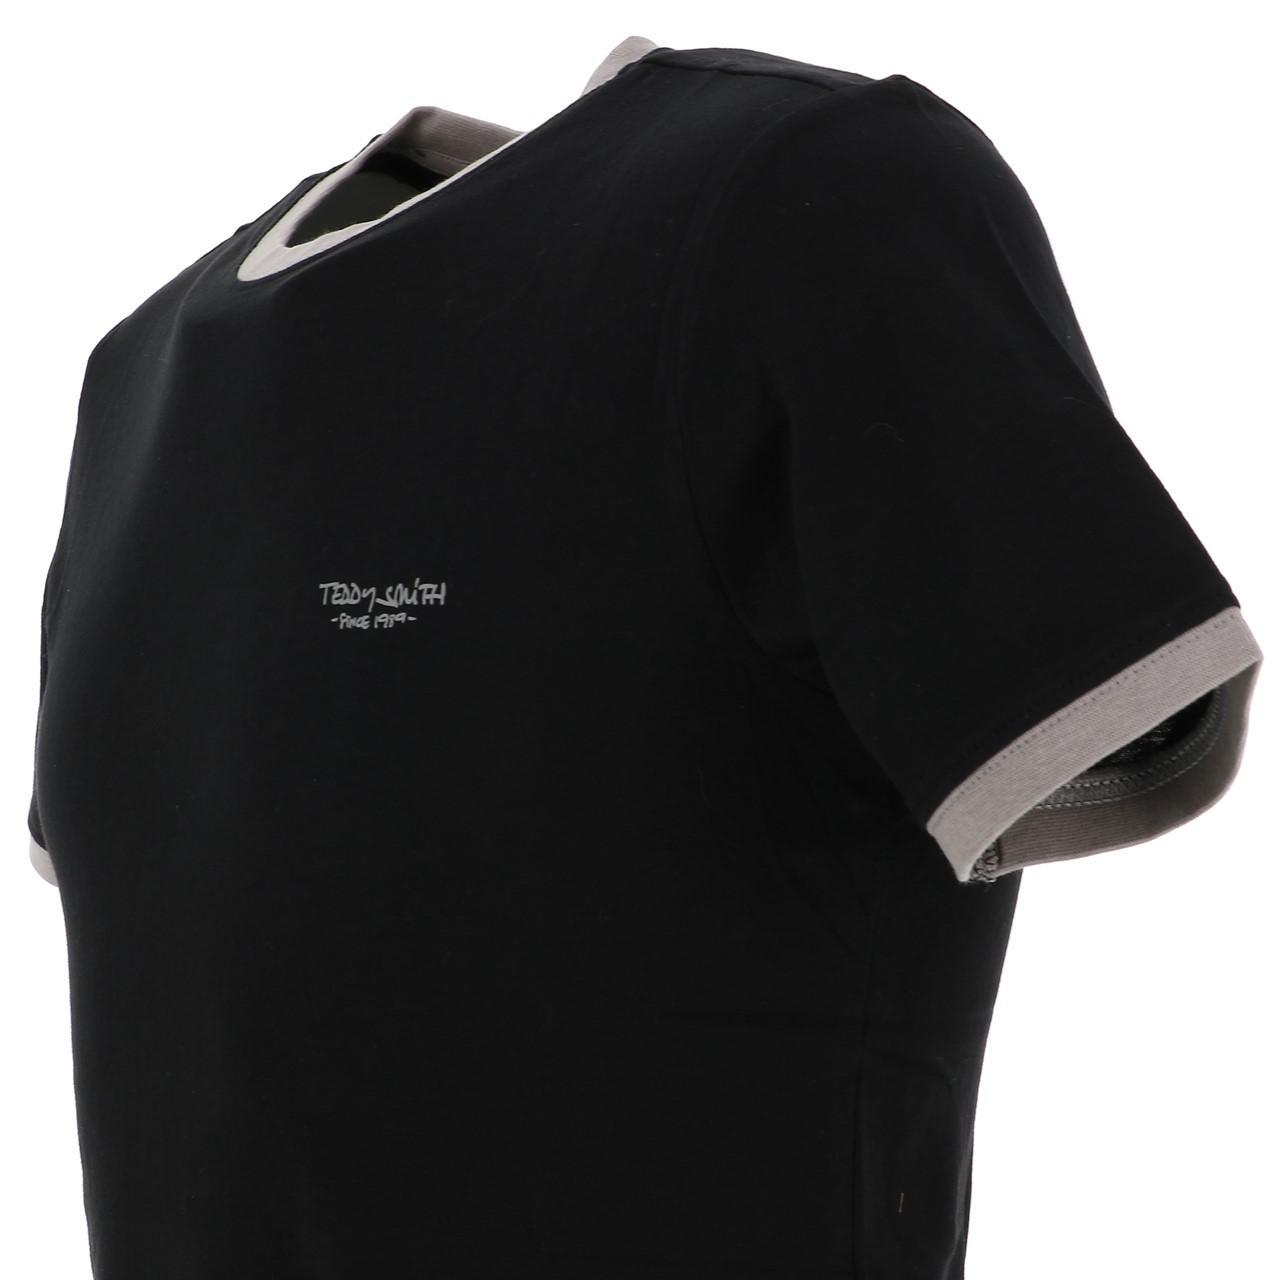 Short-Sleeve-T-Shirt-Teddy-Smith-the-Tee-Mc-Black-Black-65767-New thumbnail 3